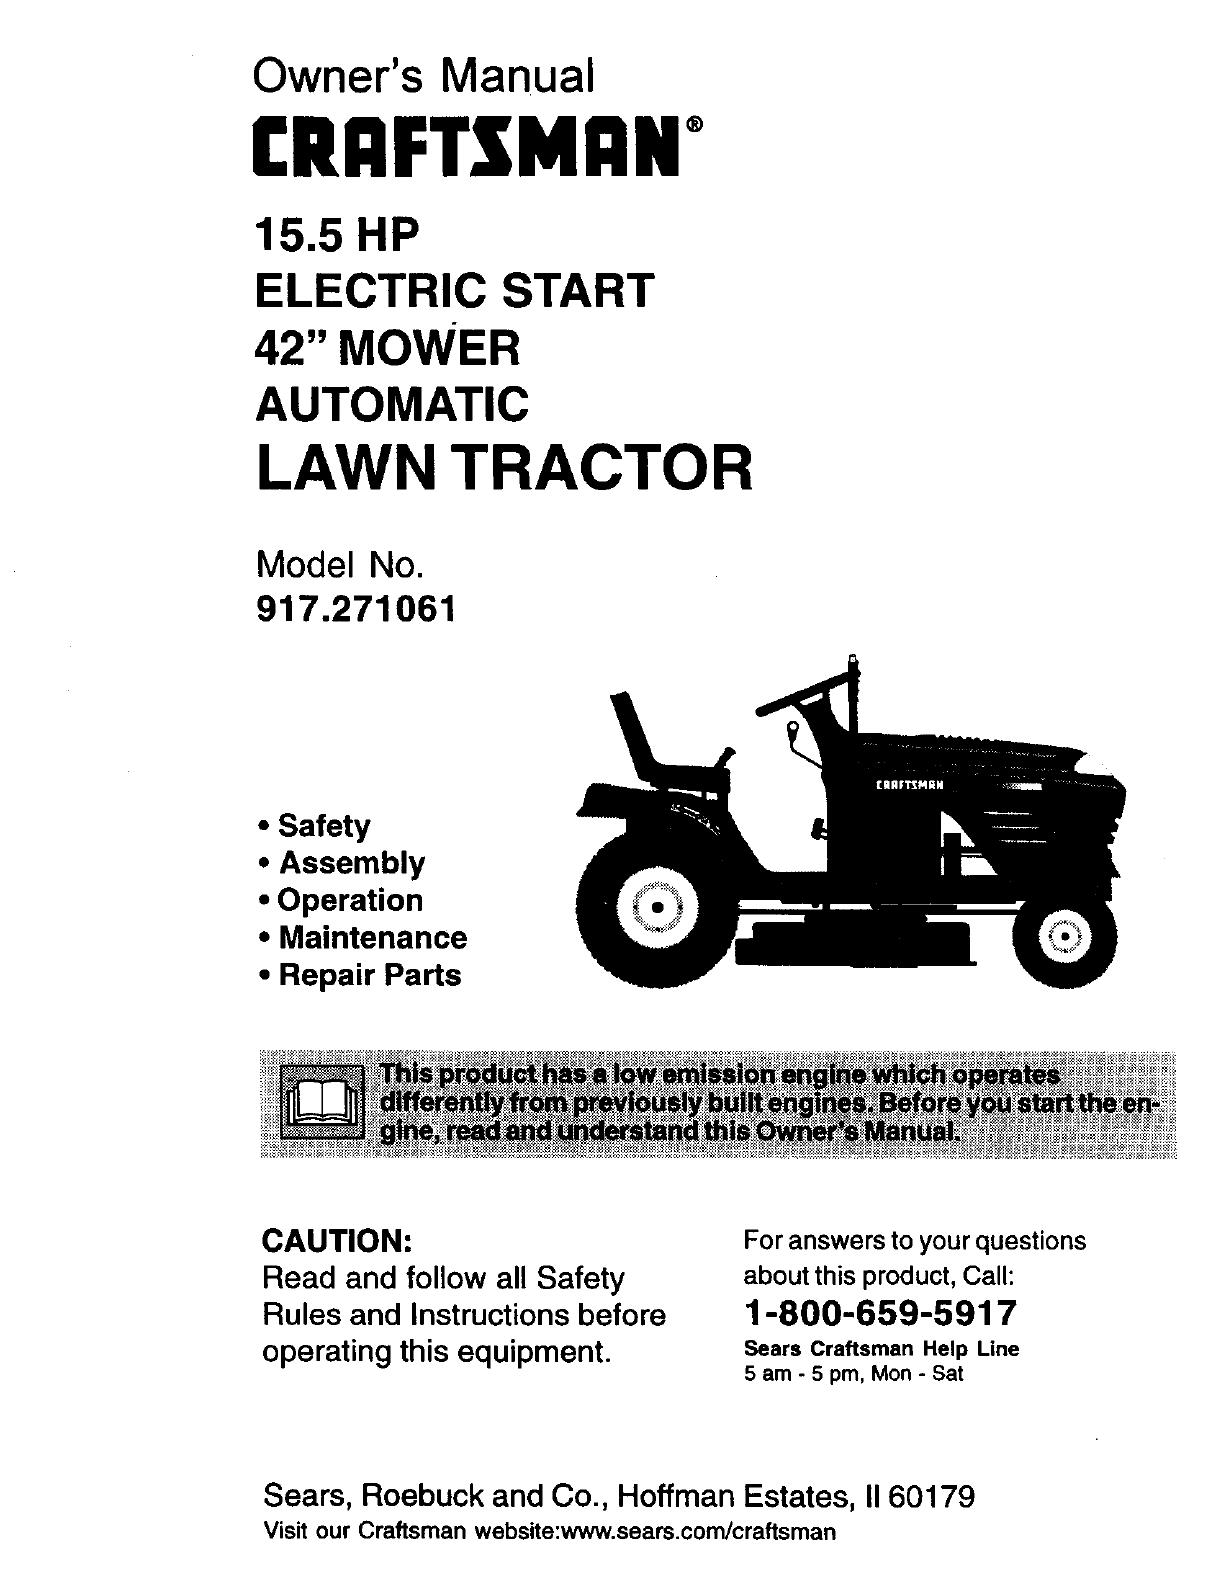 Craftsman 917271061 Owner Manual John Deere F525 Wiring Diagram Owners